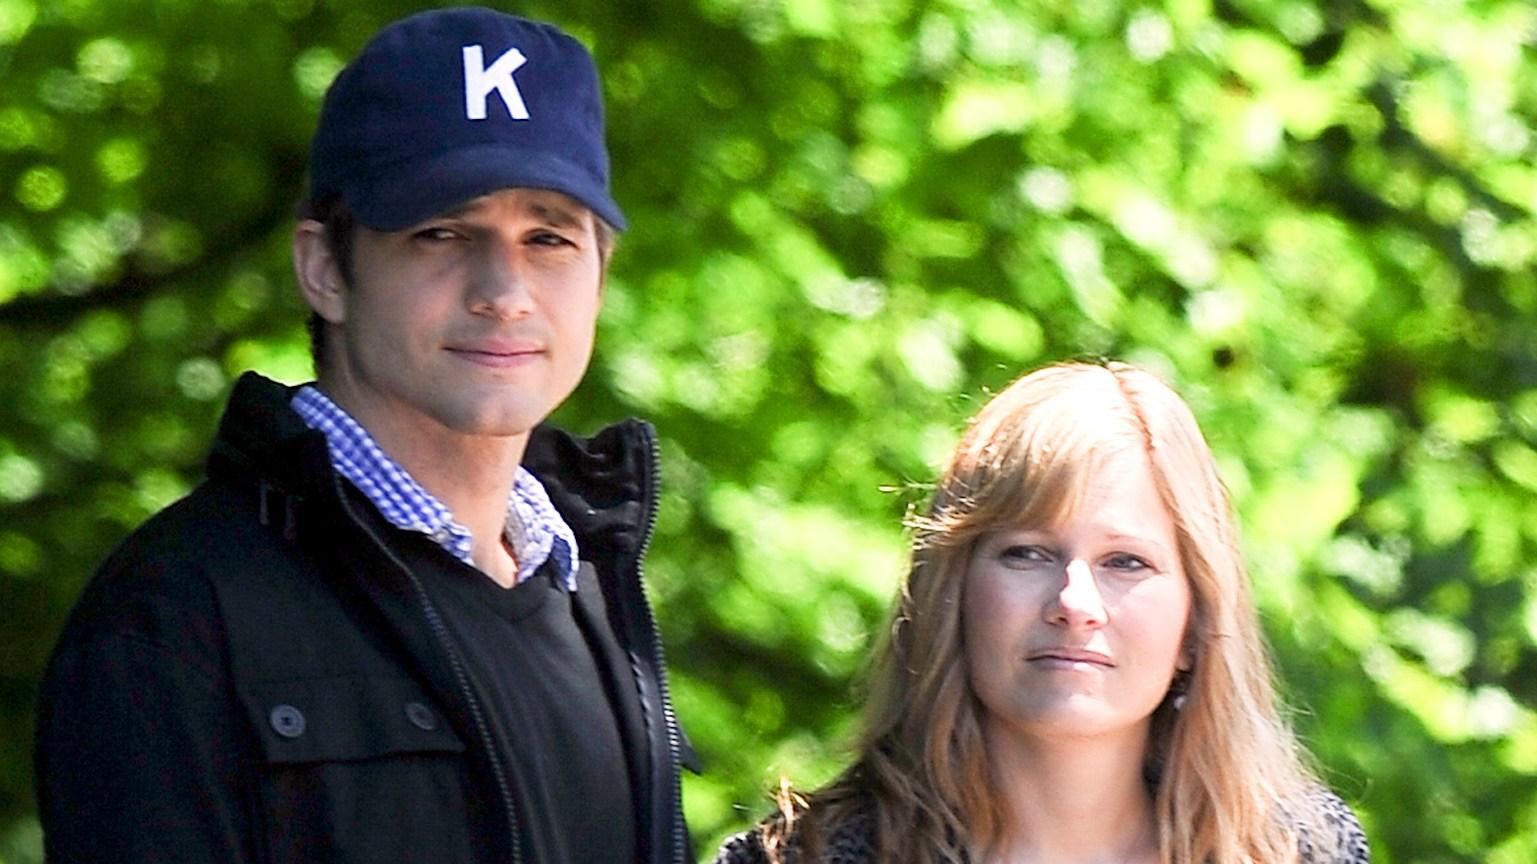 Ashton Kutcher and his sister Tausha Kutcher in June 2013.